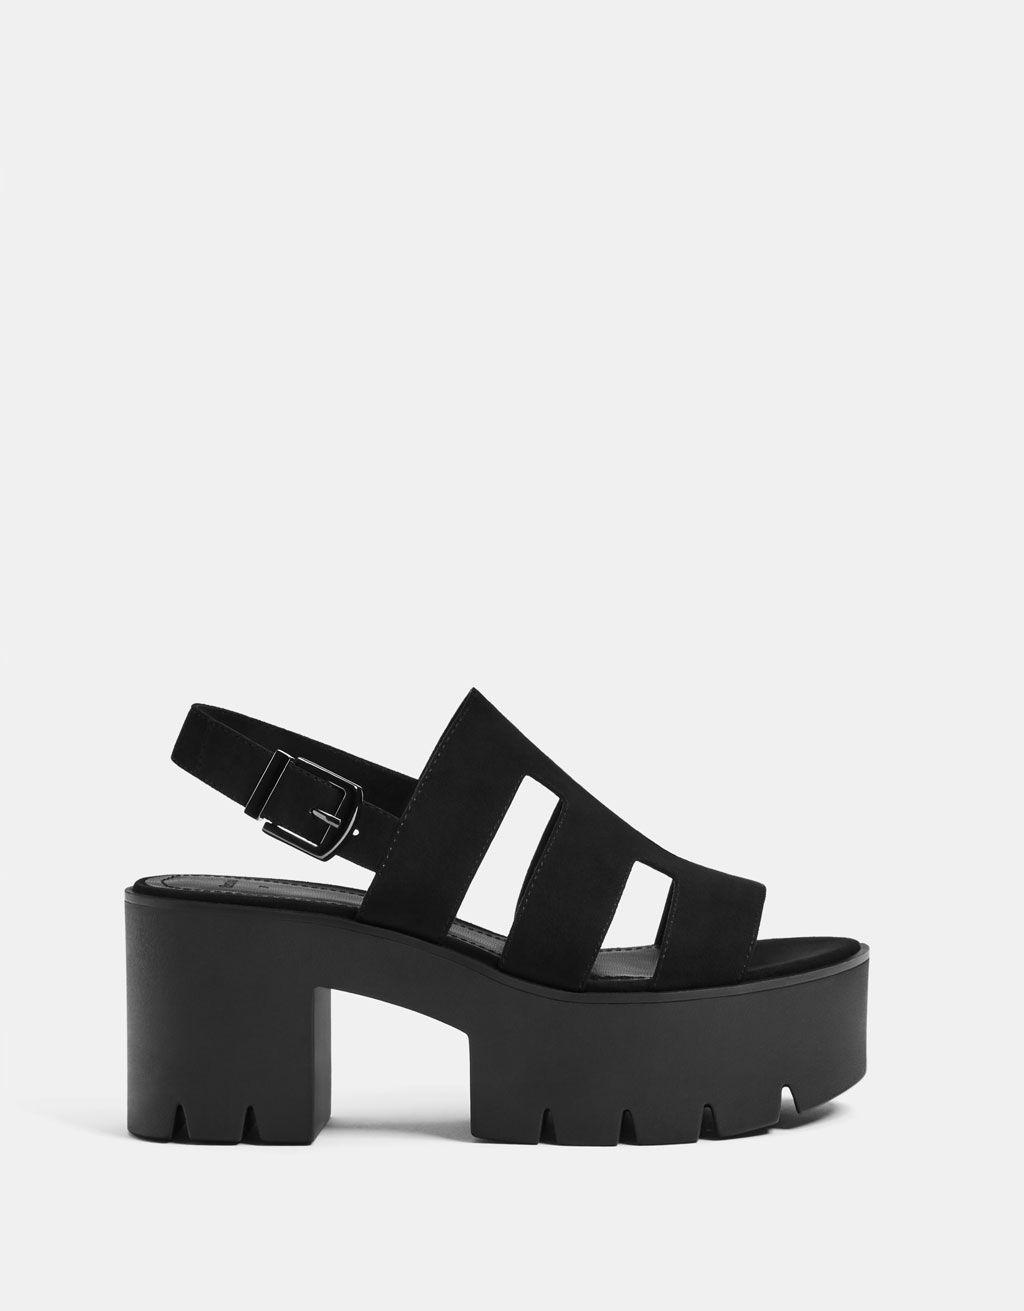 Sandalia plataforma tiras | Zapatos de tacones, Plataformas